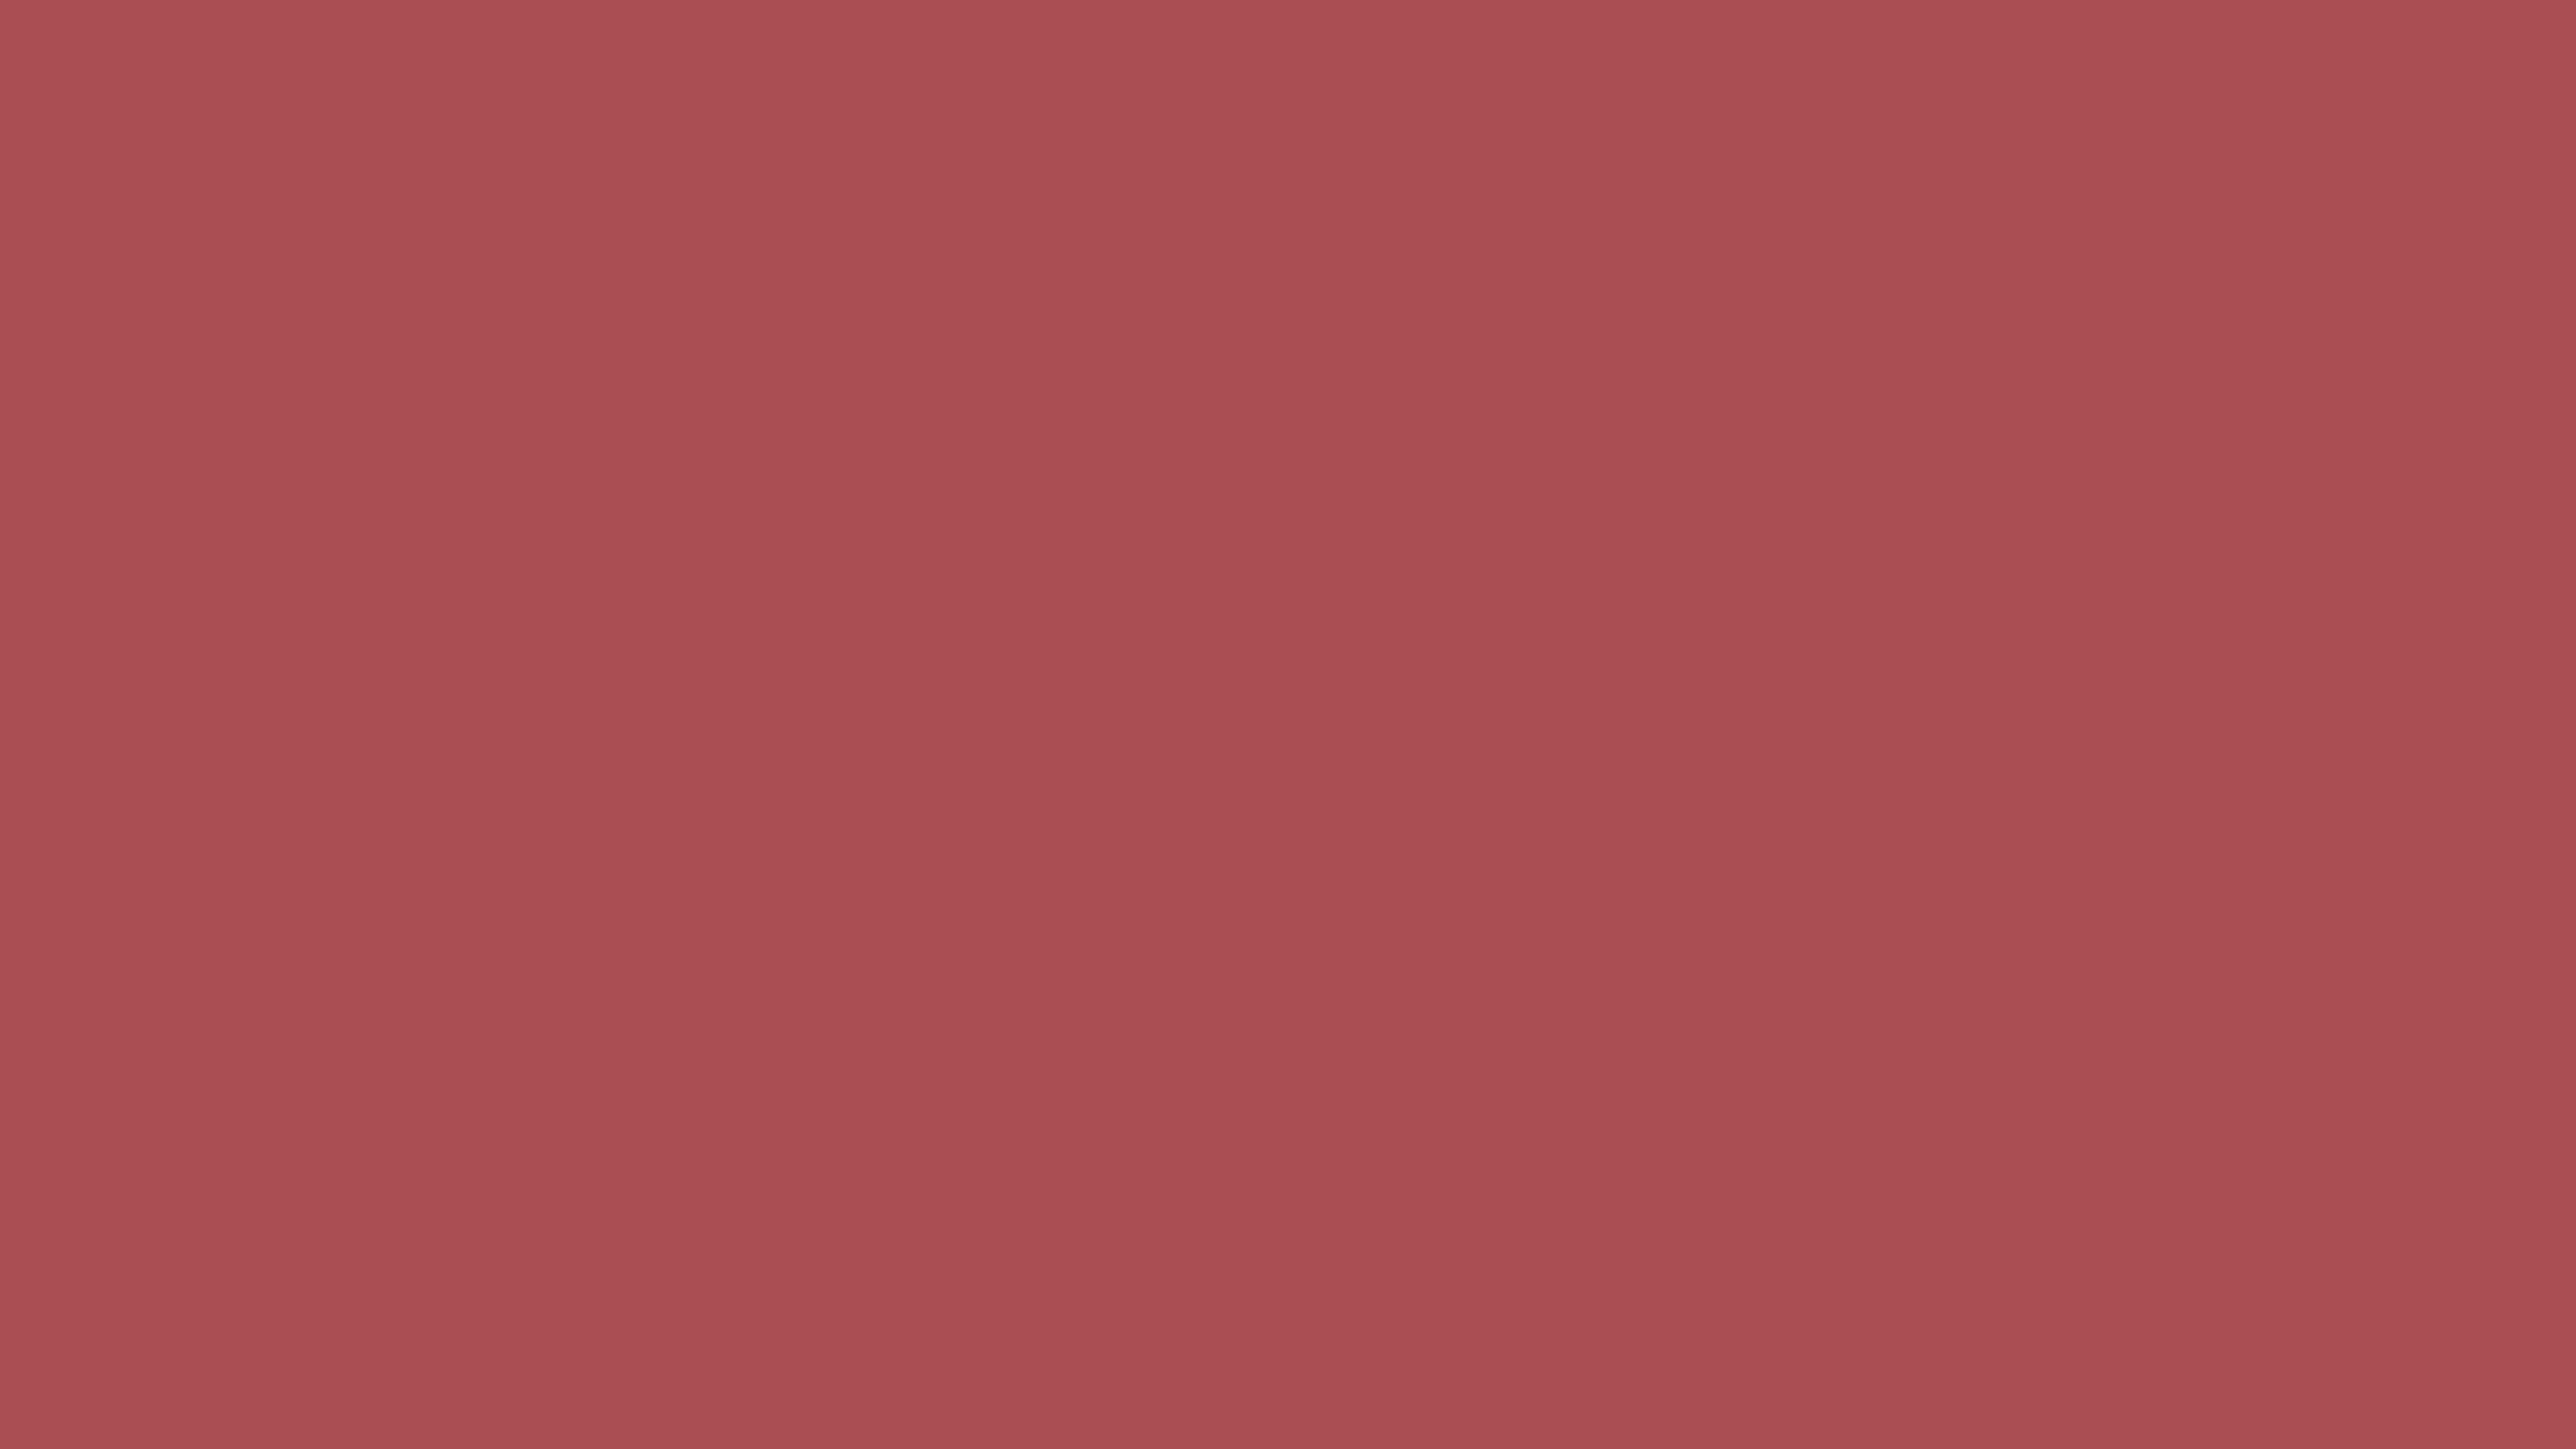 4096x2304 Rose Vale Solid Color Background